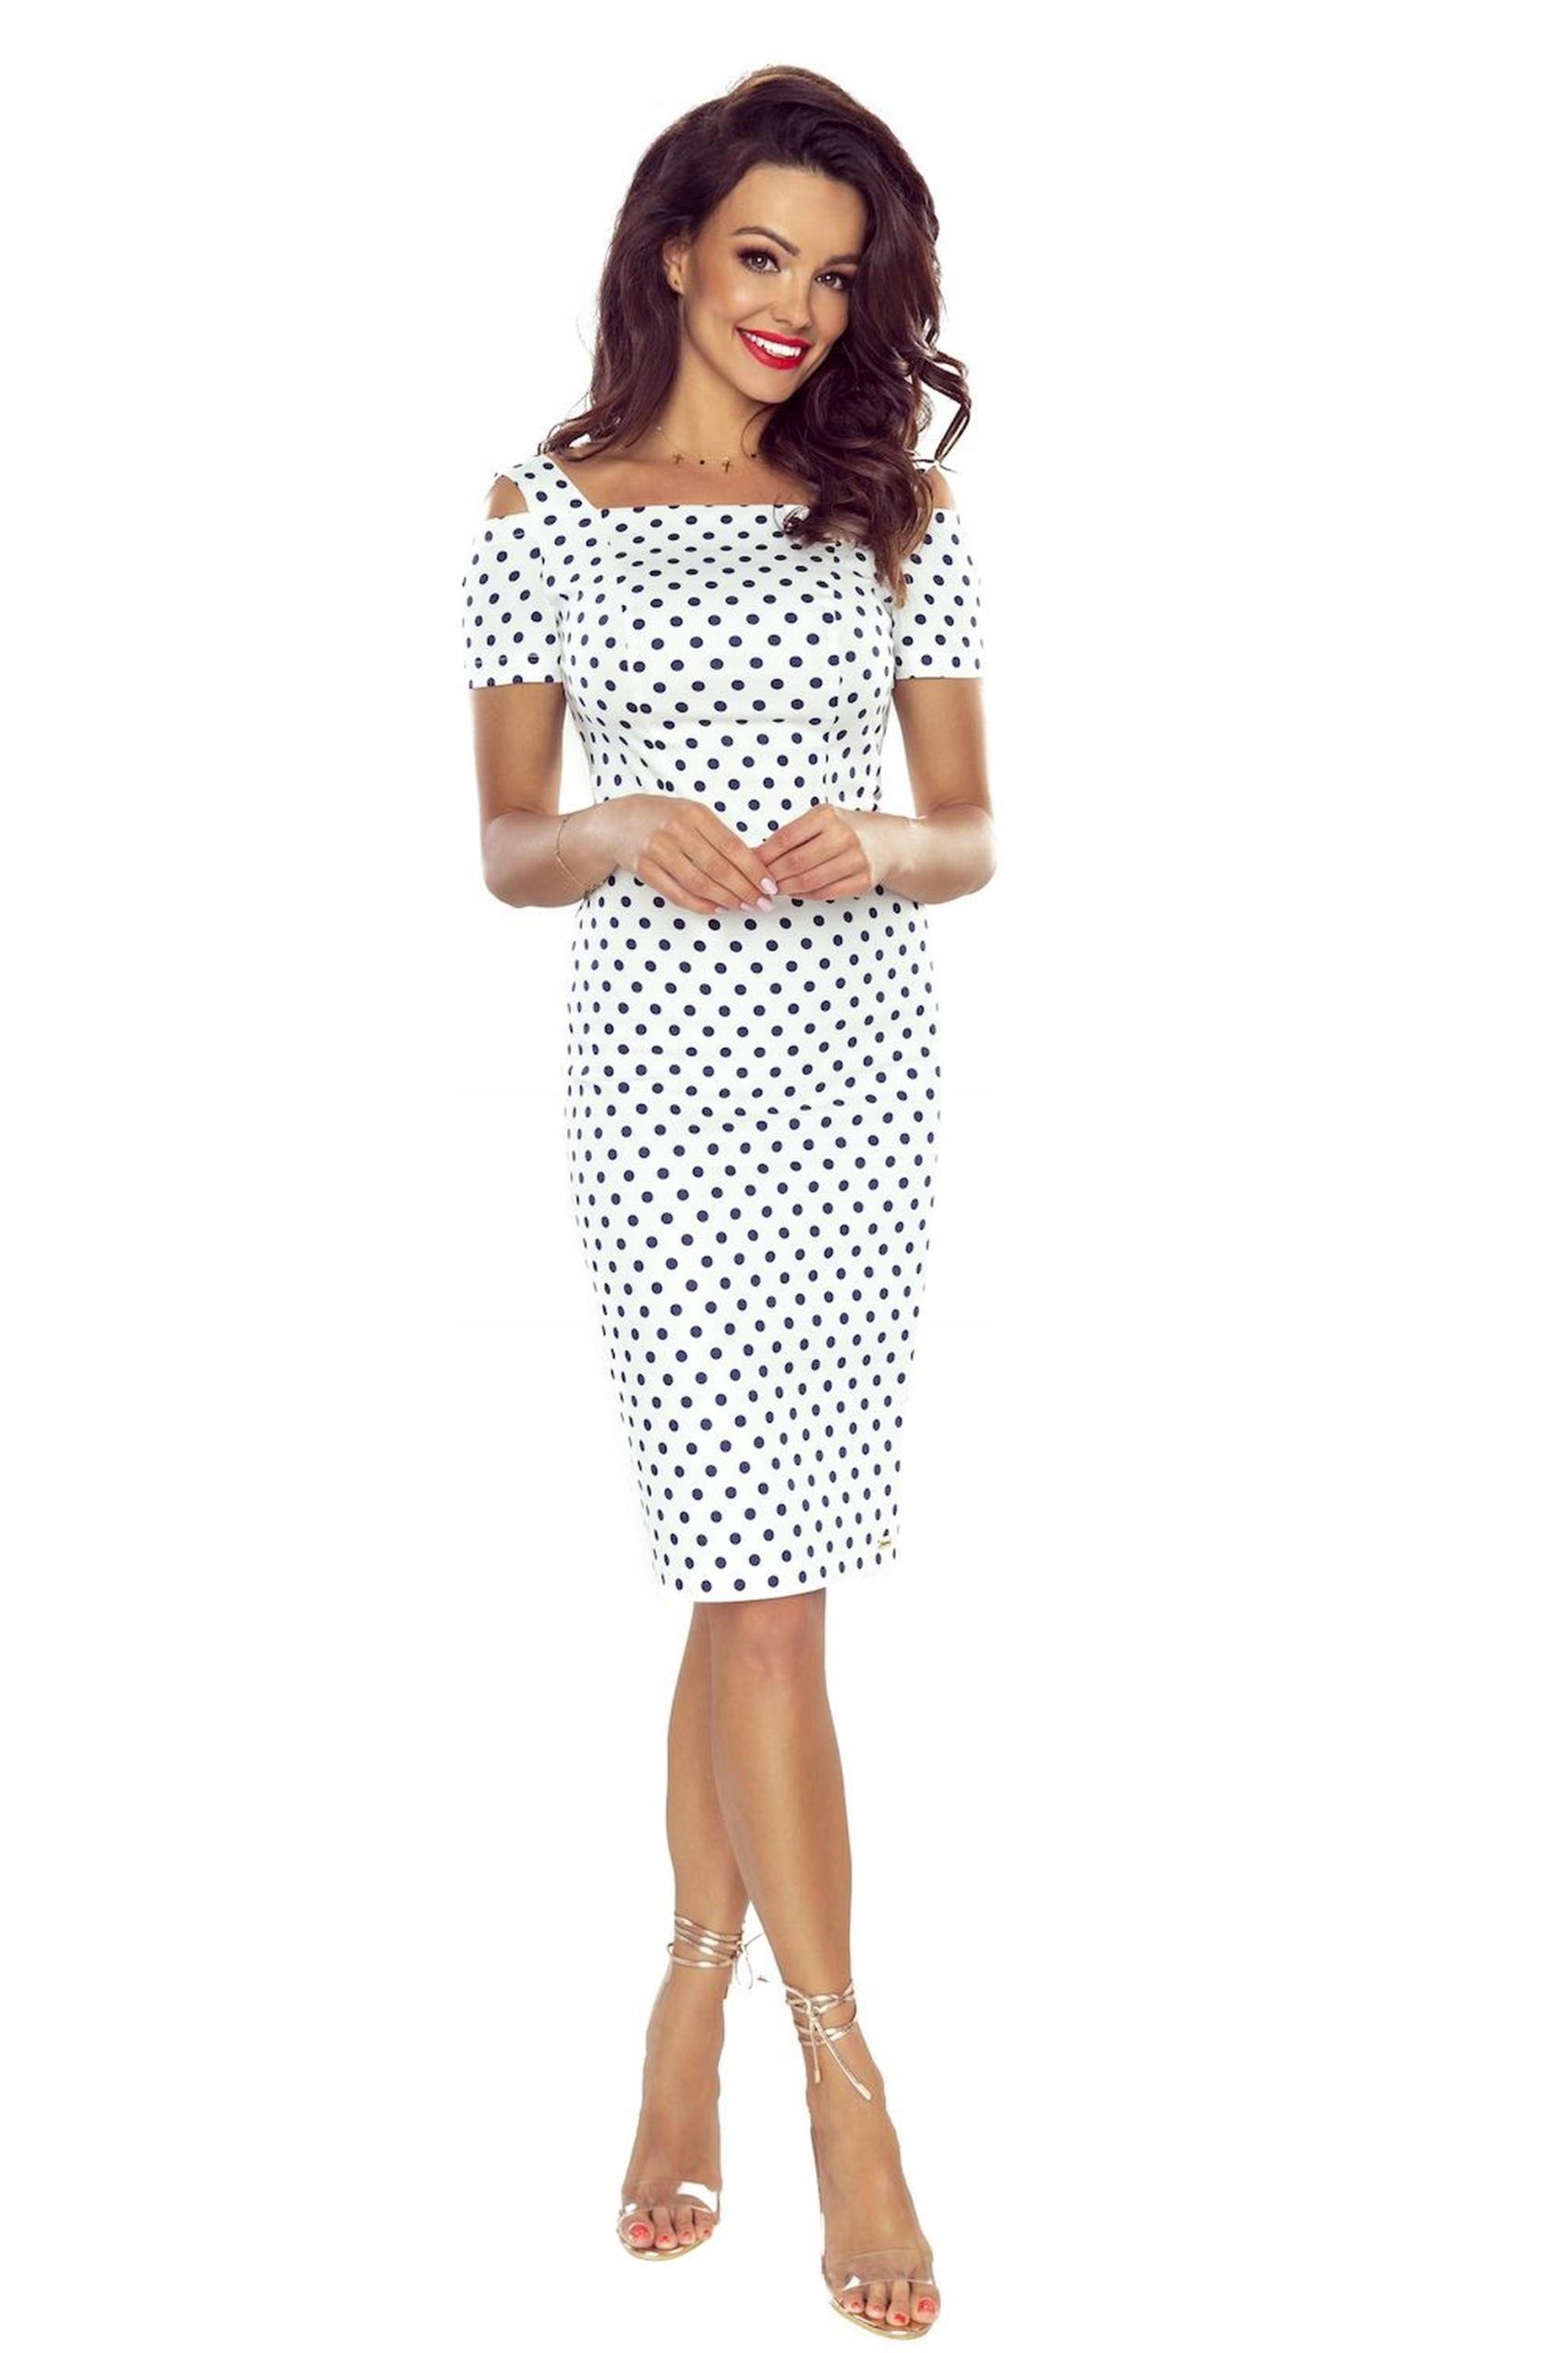 ELEGANCKA PROSTA Sukienka NA WESELE 54826 S 36